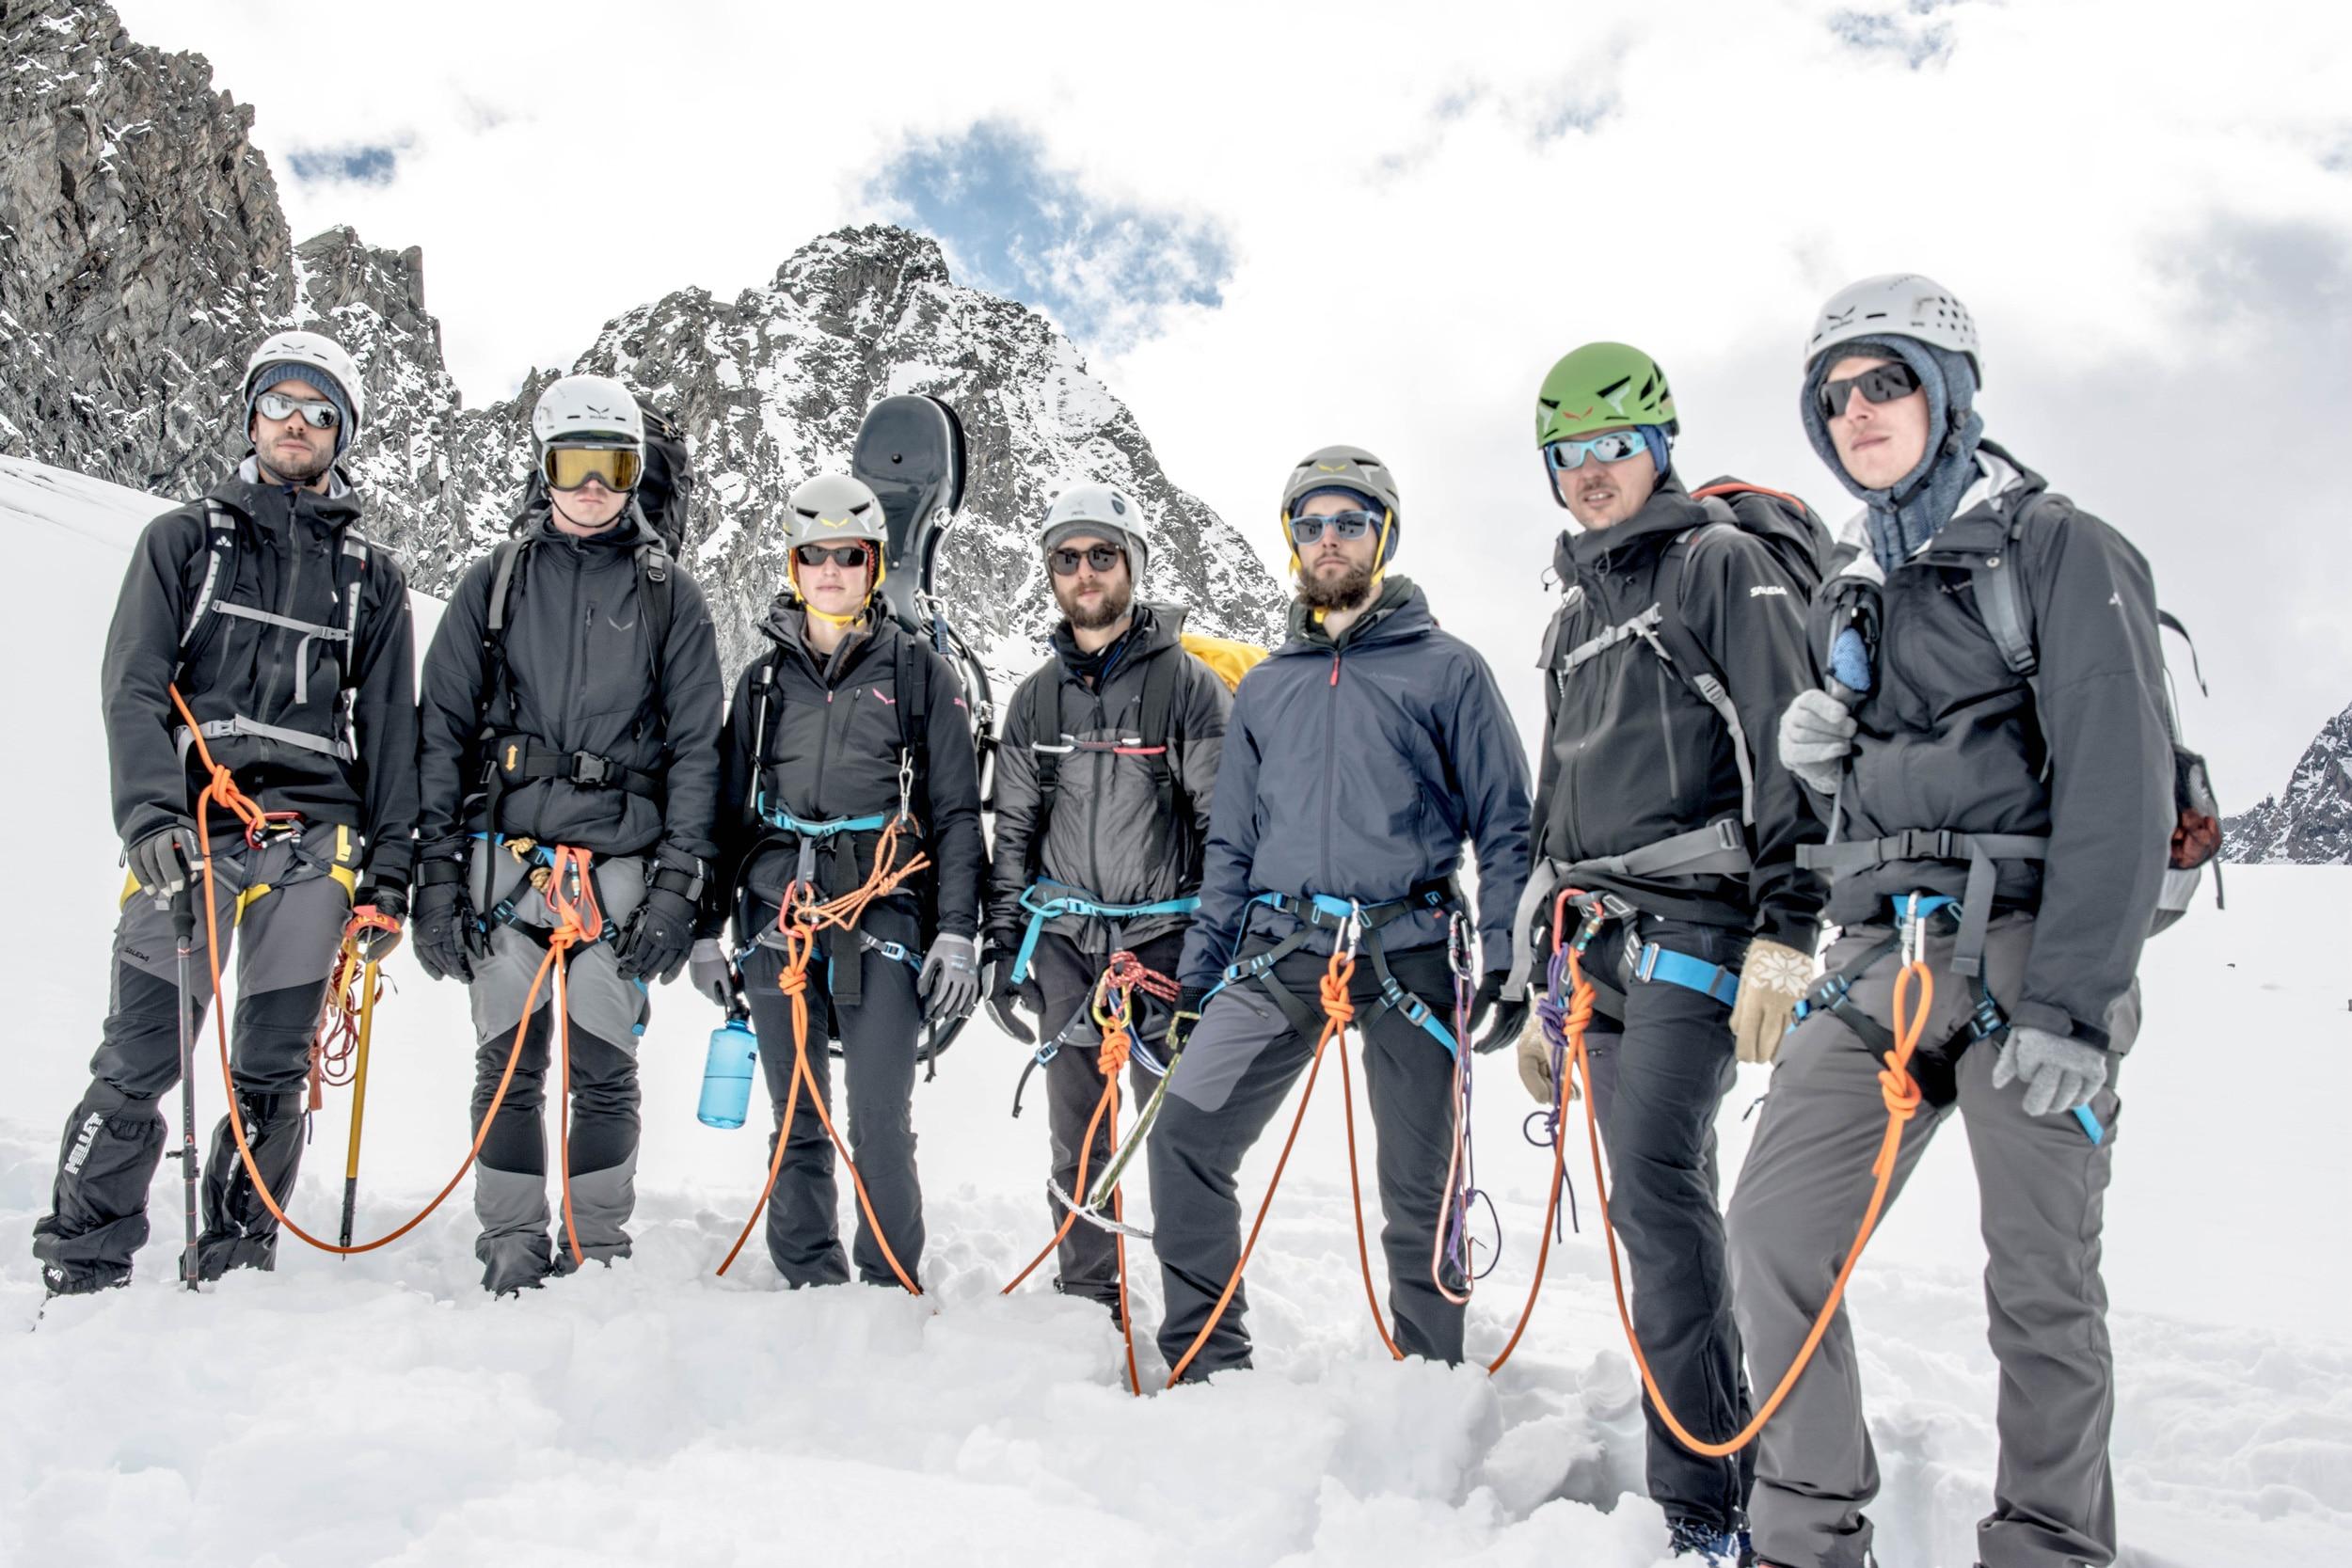 Klettersteig Uk : Best empfehlenswerte klettersteige images